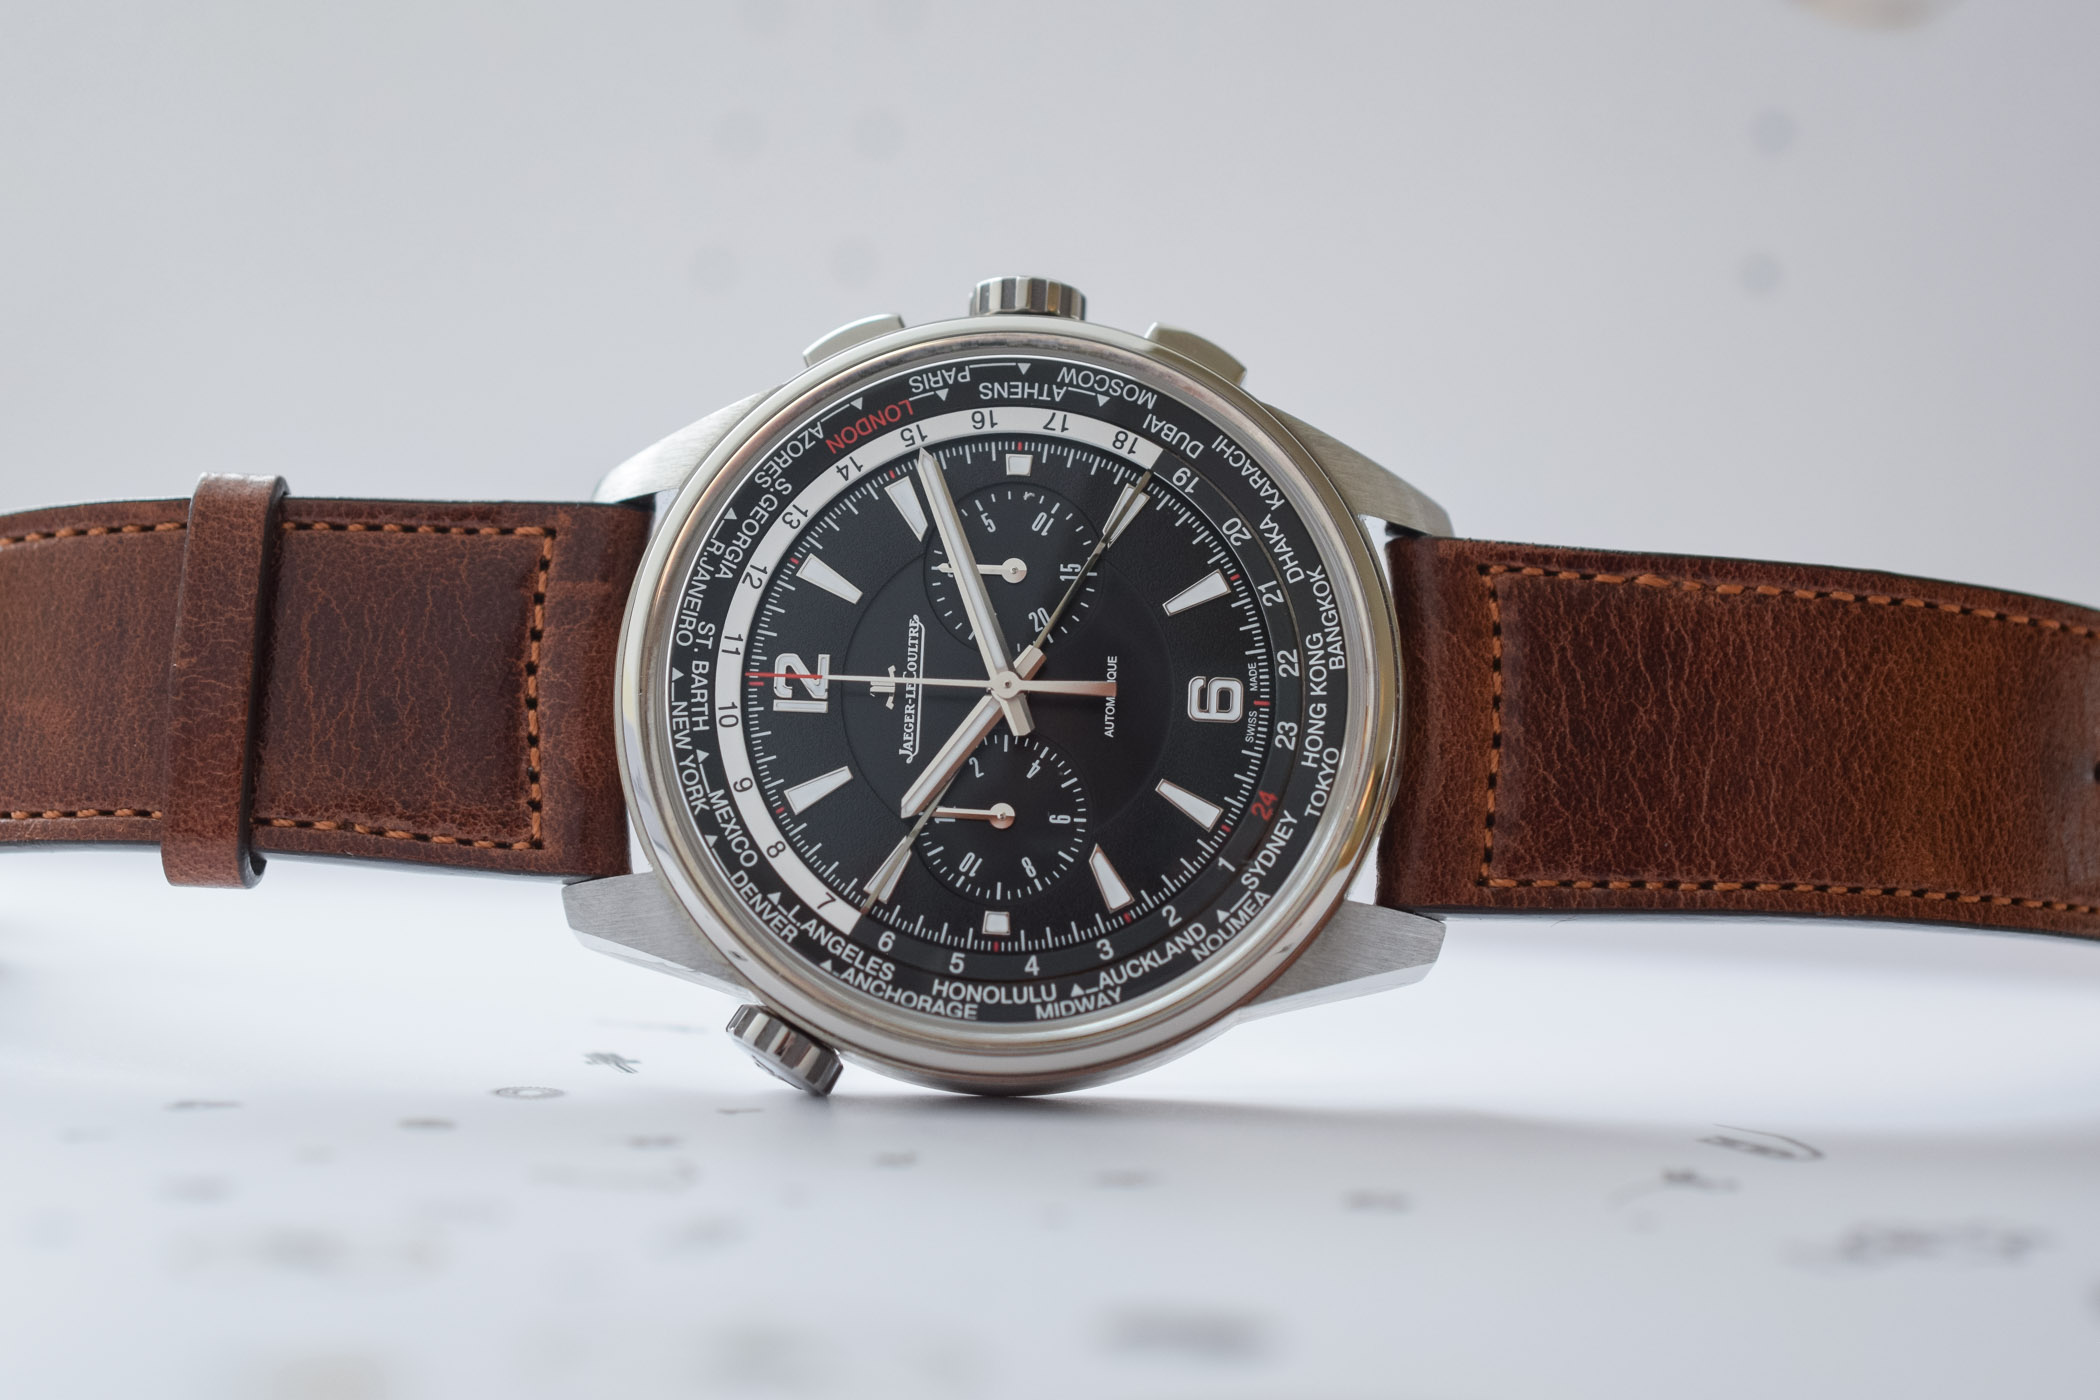 Jaeger-LeCoultre Polaris Chronograph WorldTimer - Review - 5